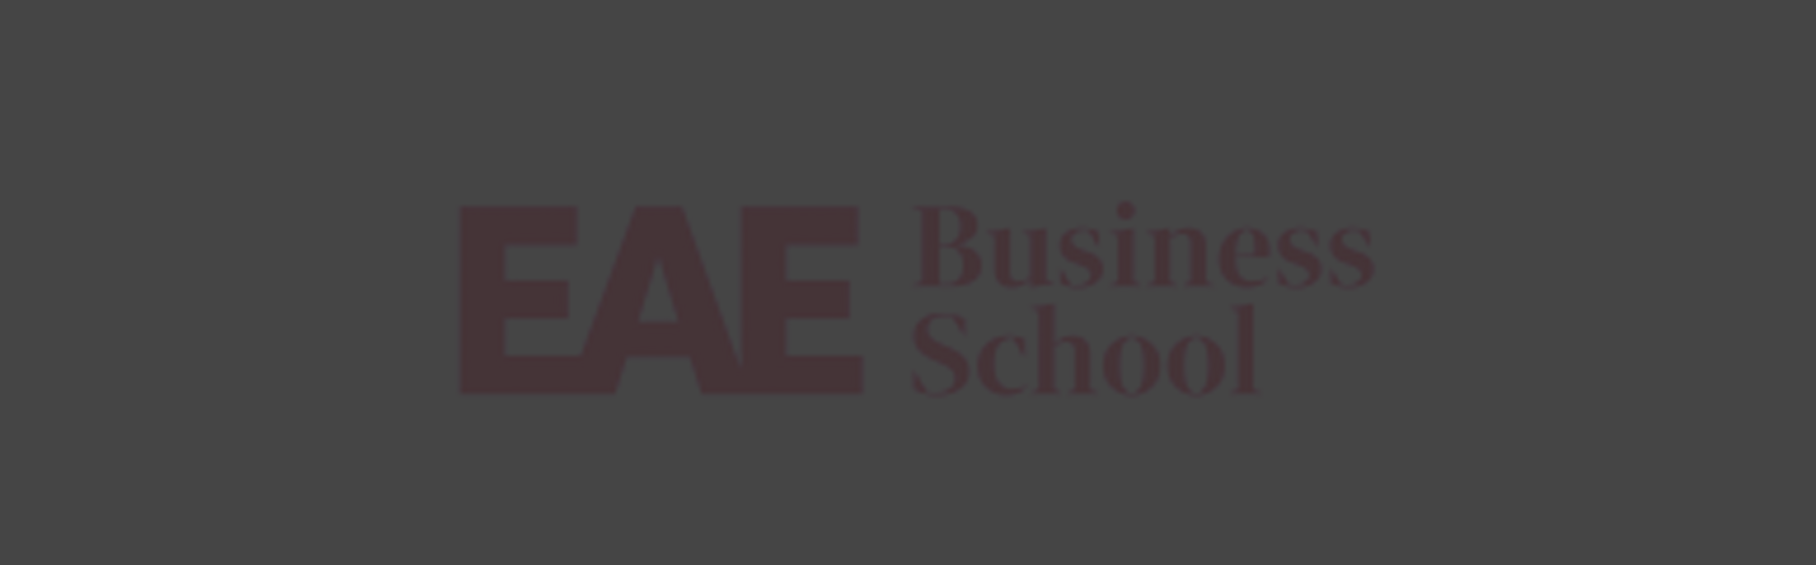 EAE, Business School, Barcelona, Sabadell